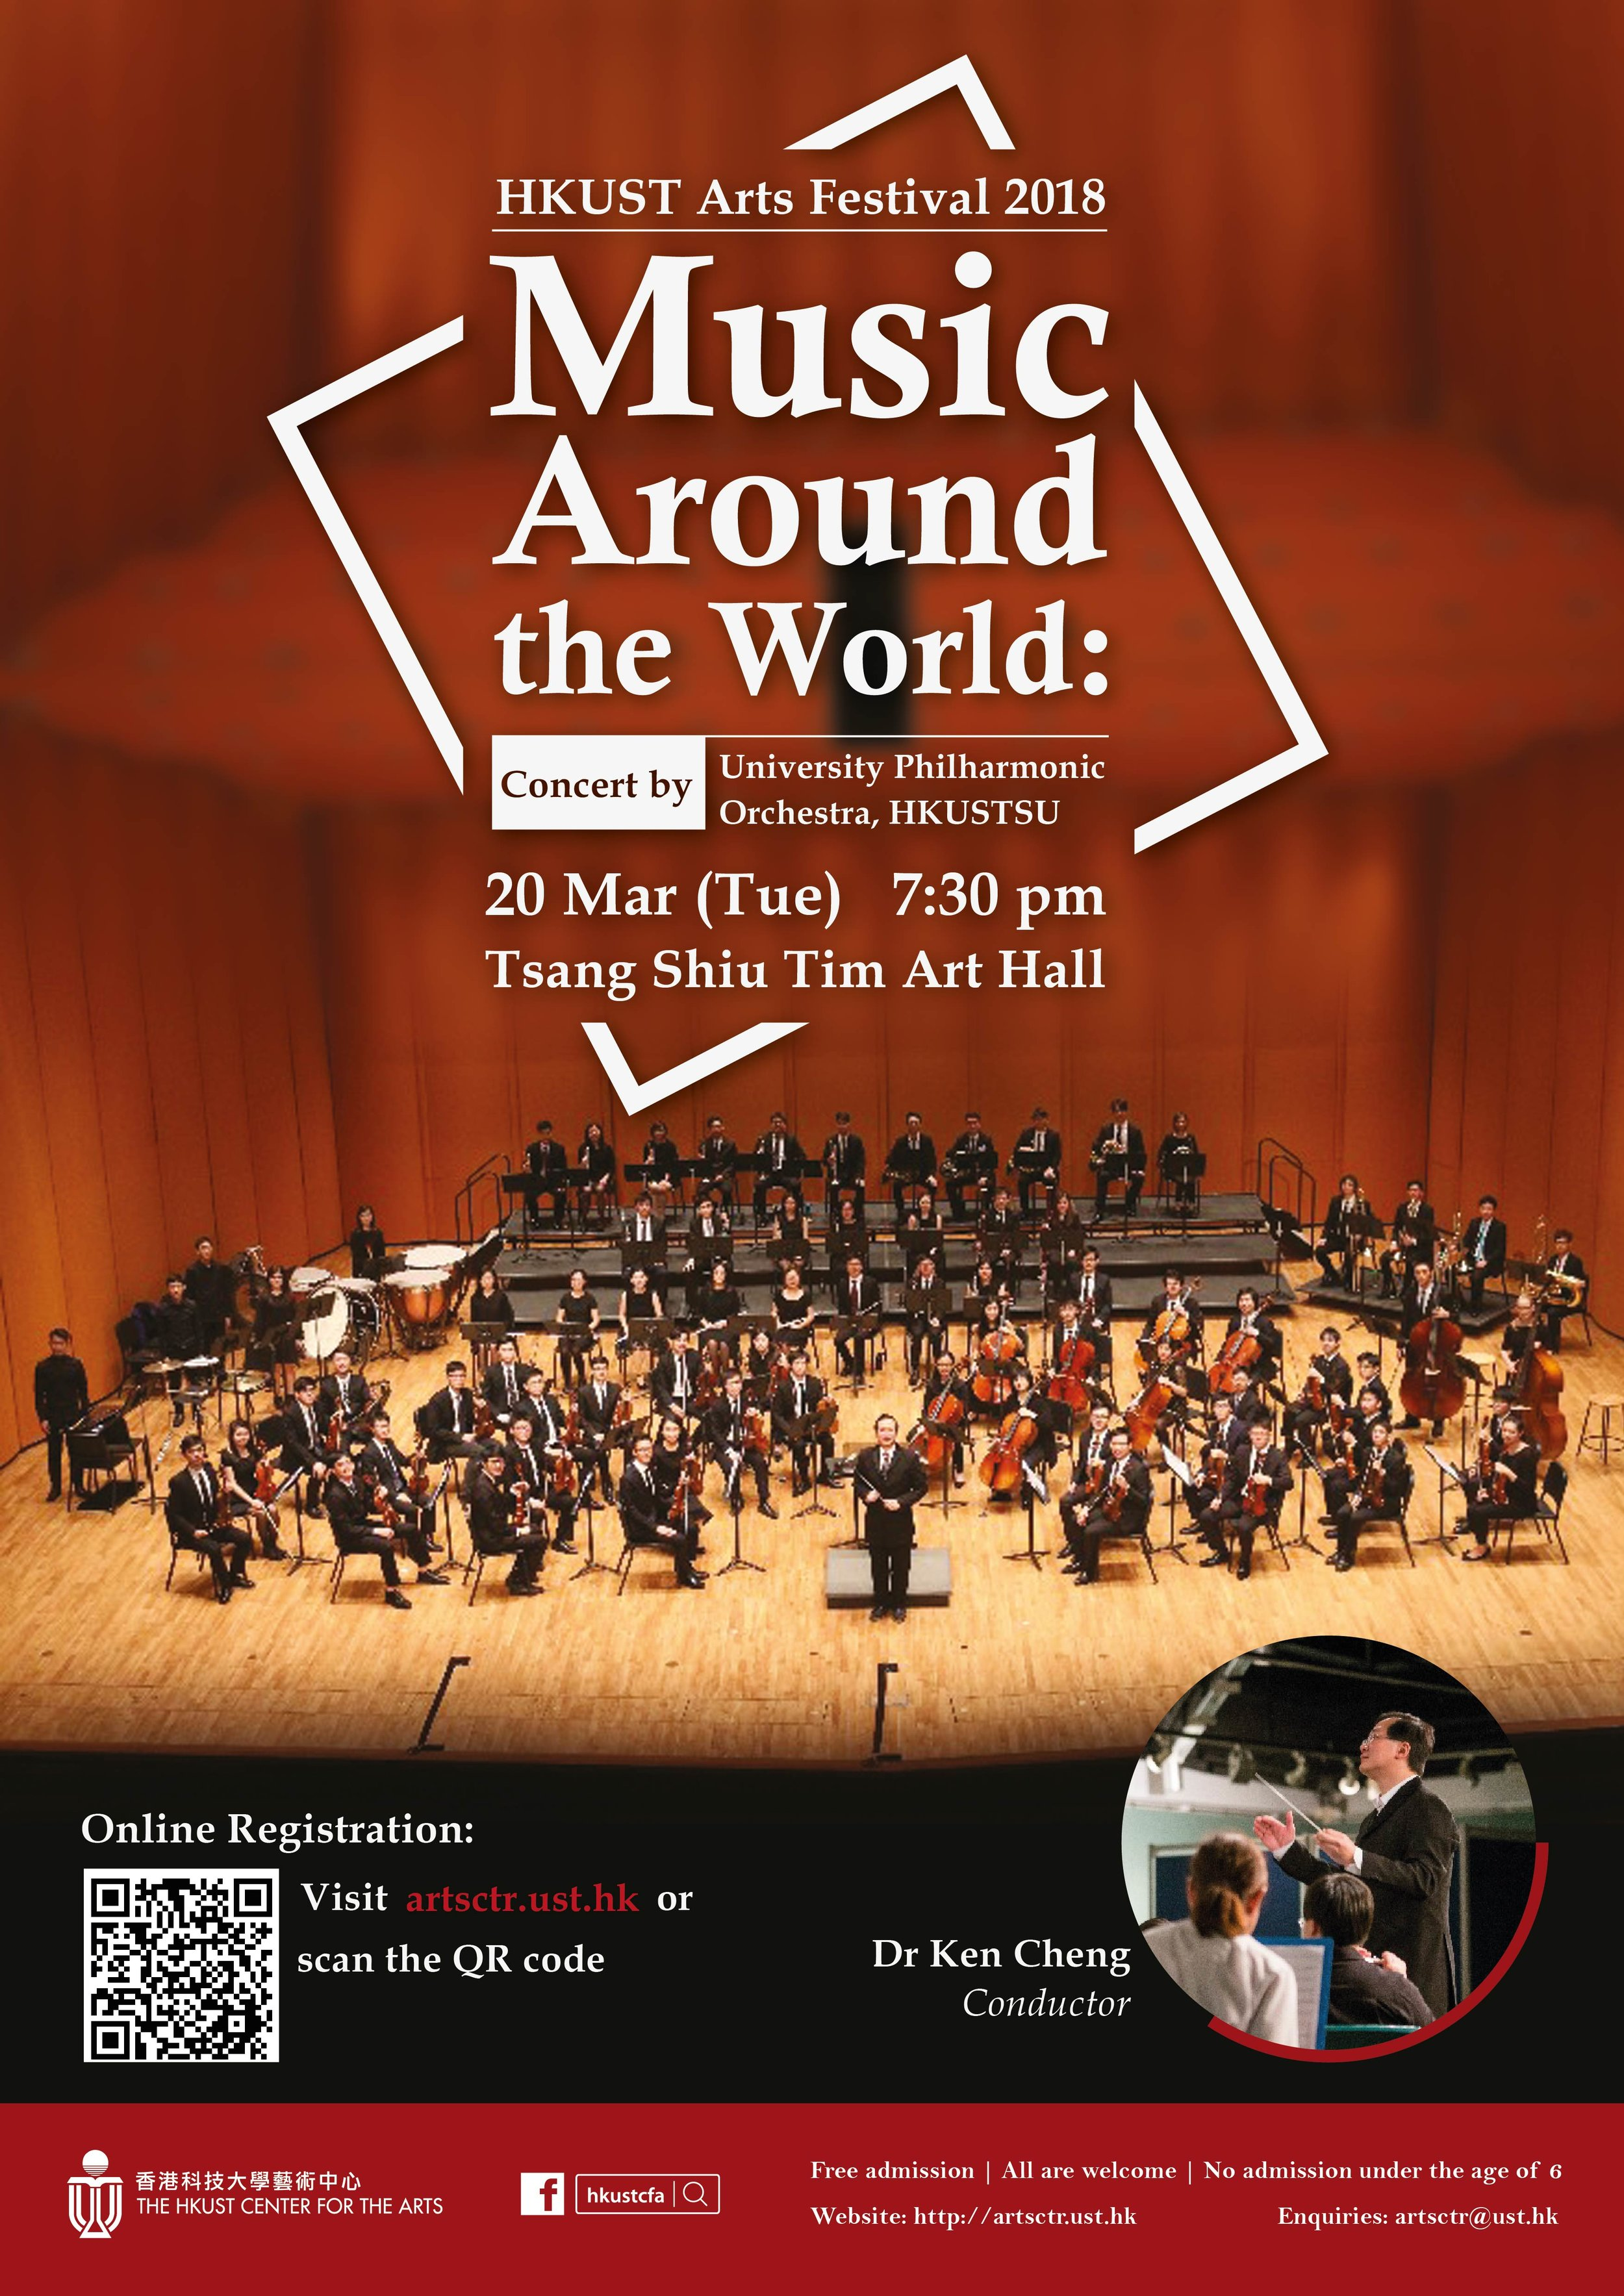 Music Around the World: Concert by University Philharmonic Orchestra, HKUSTSU  Mar 20, 2018